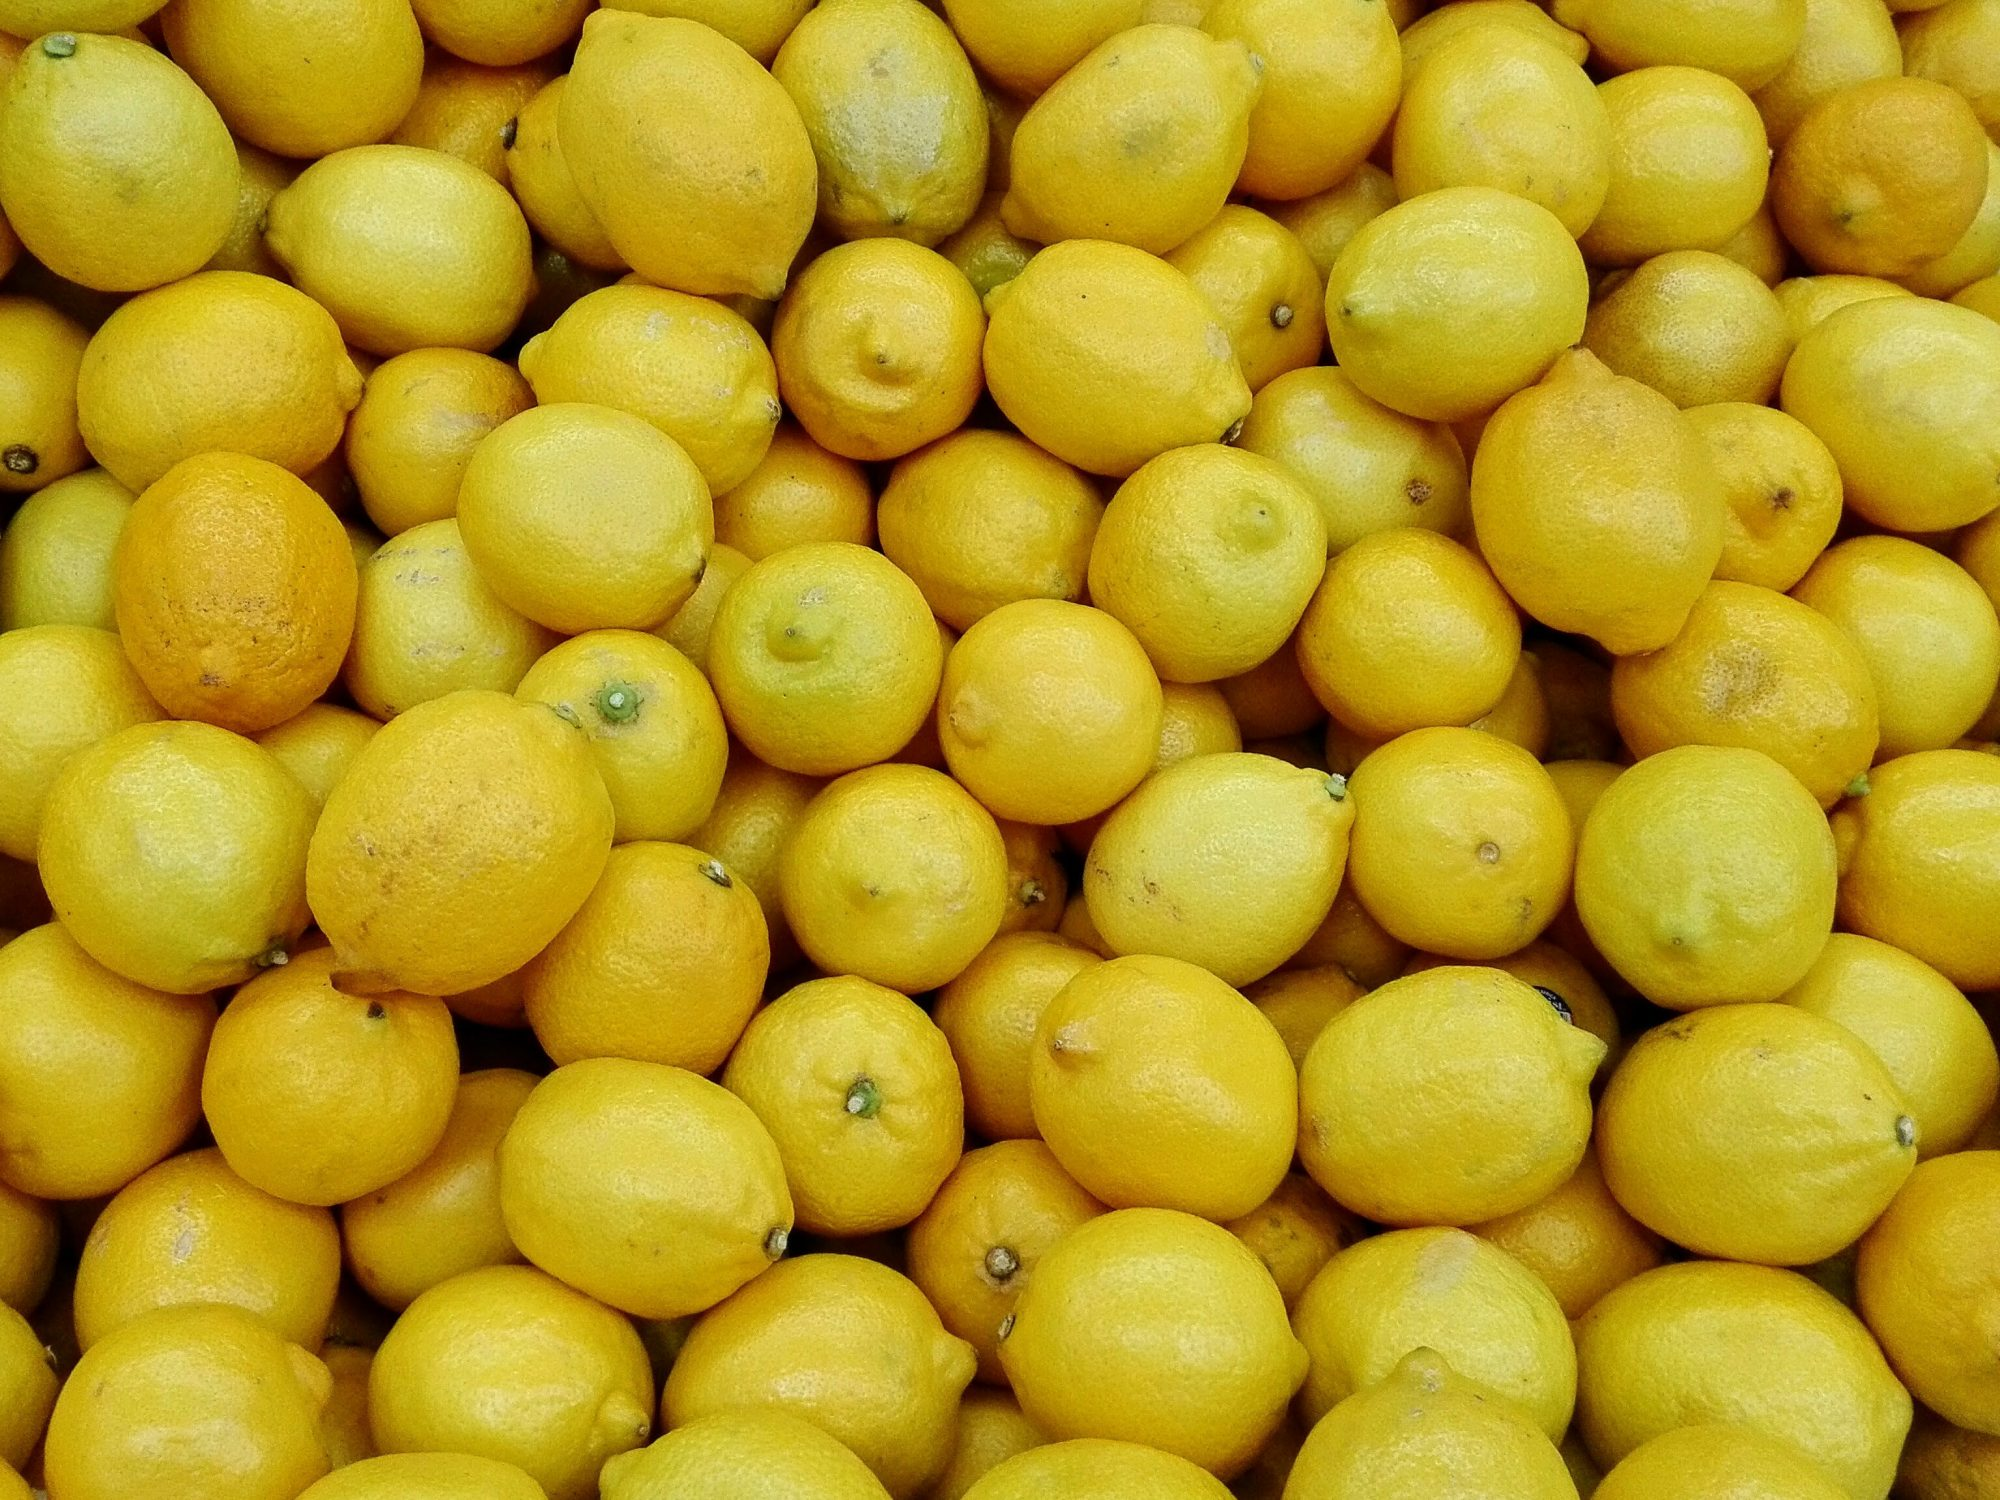 Lemons Getty 4/22/20